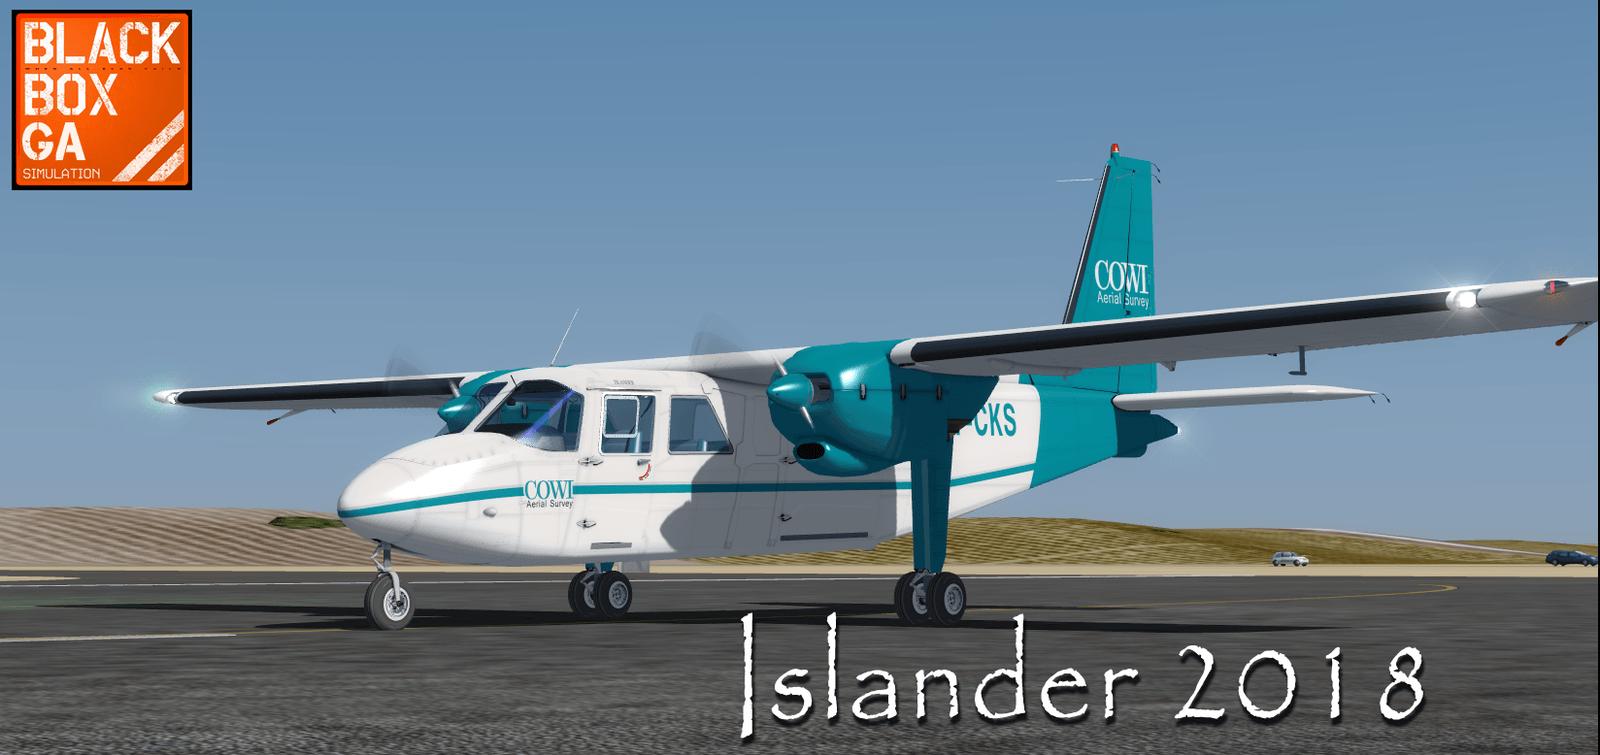 Black Box Islander Aircraft 23